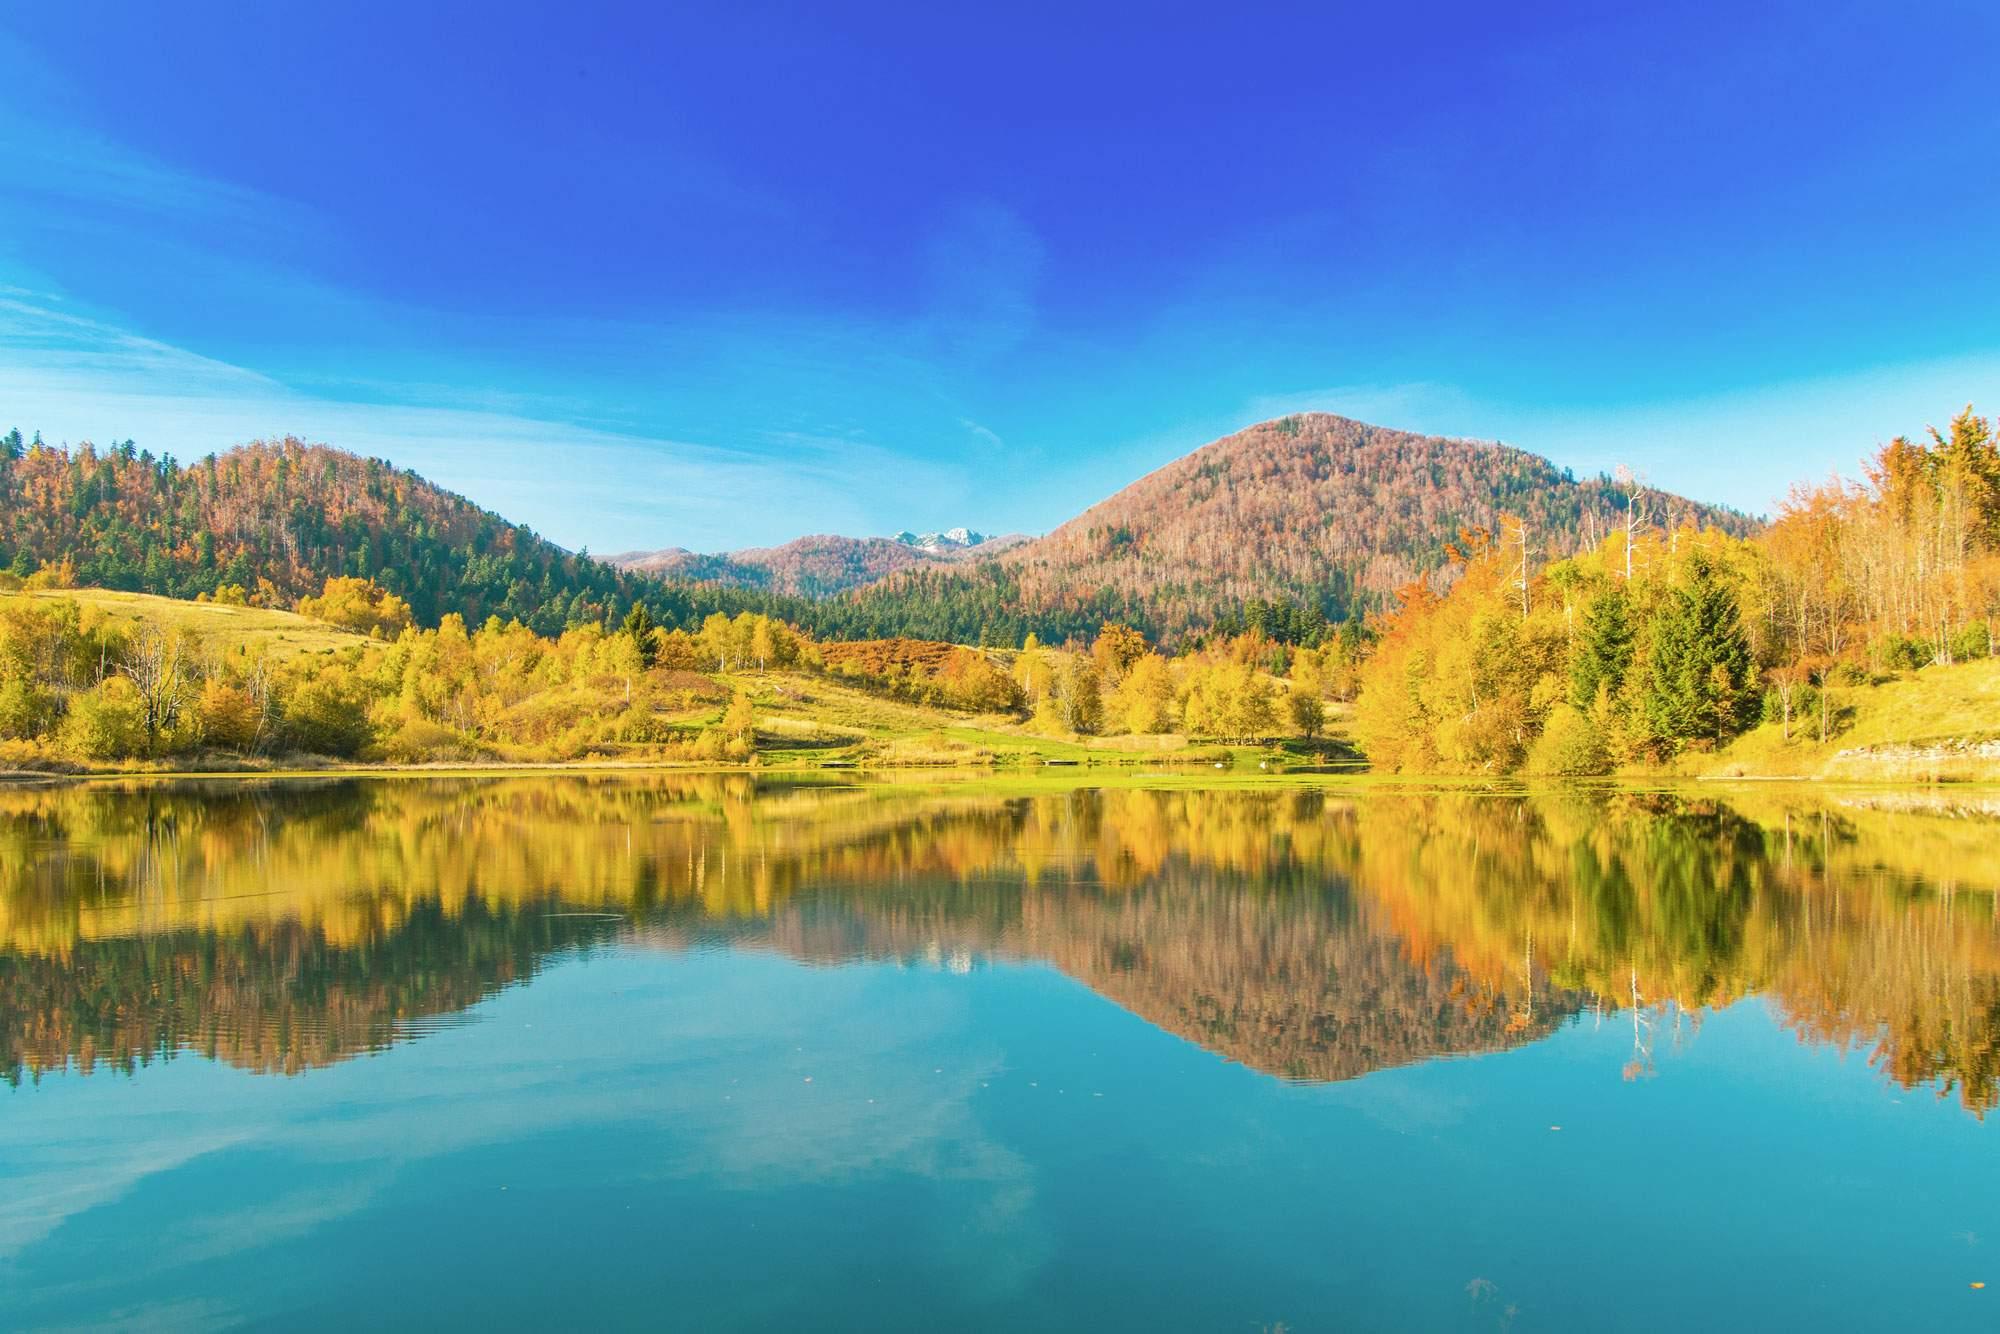 risnjak-national-park-croatia-hiking-outdoor-travel